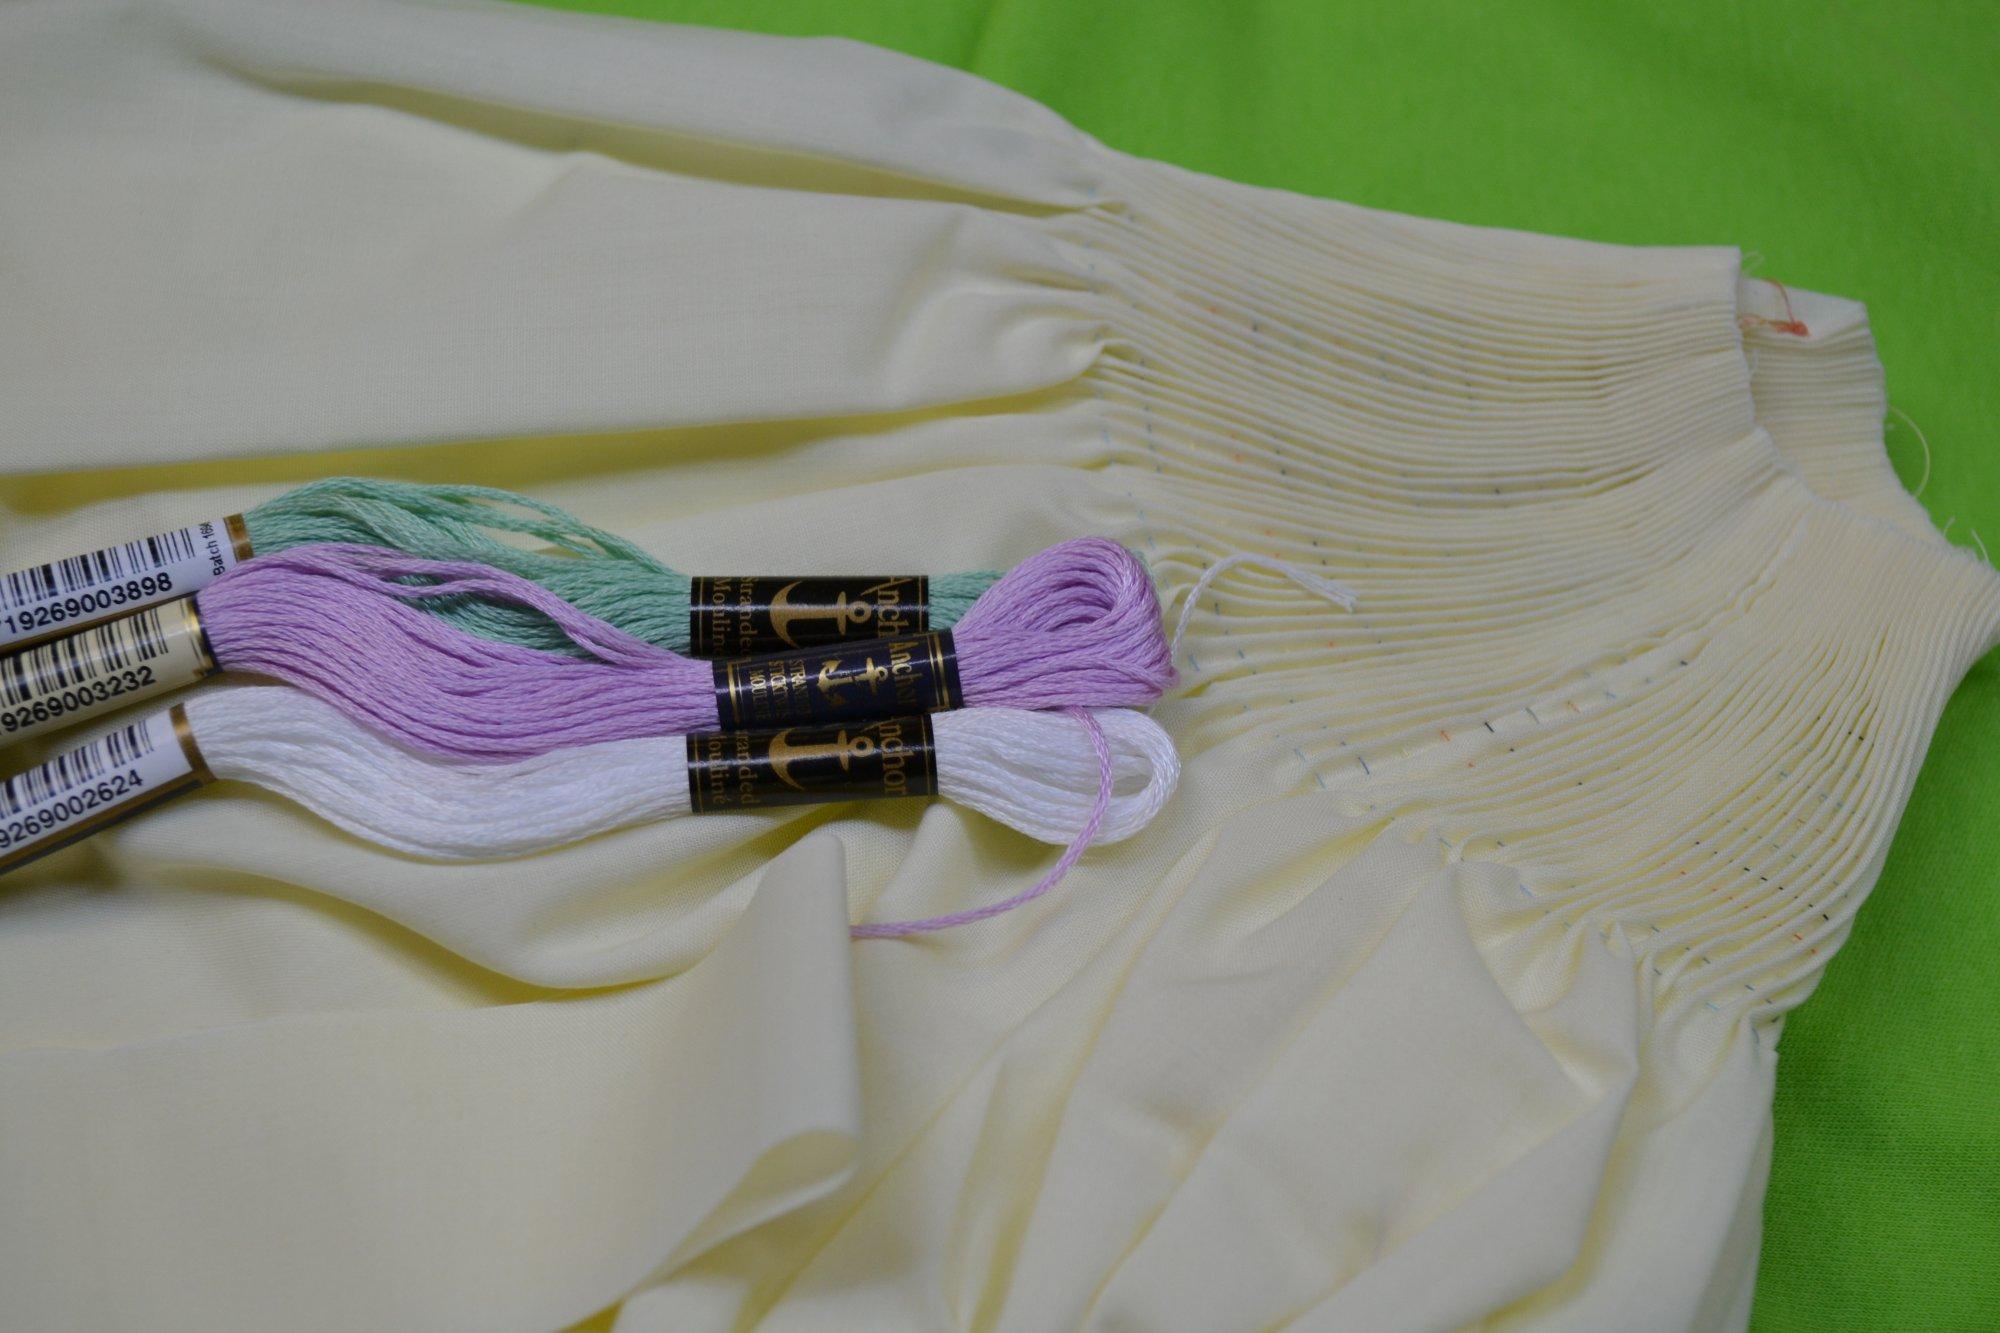 Bishop Kit - Pleated Sleeve Moonbeam 3 months